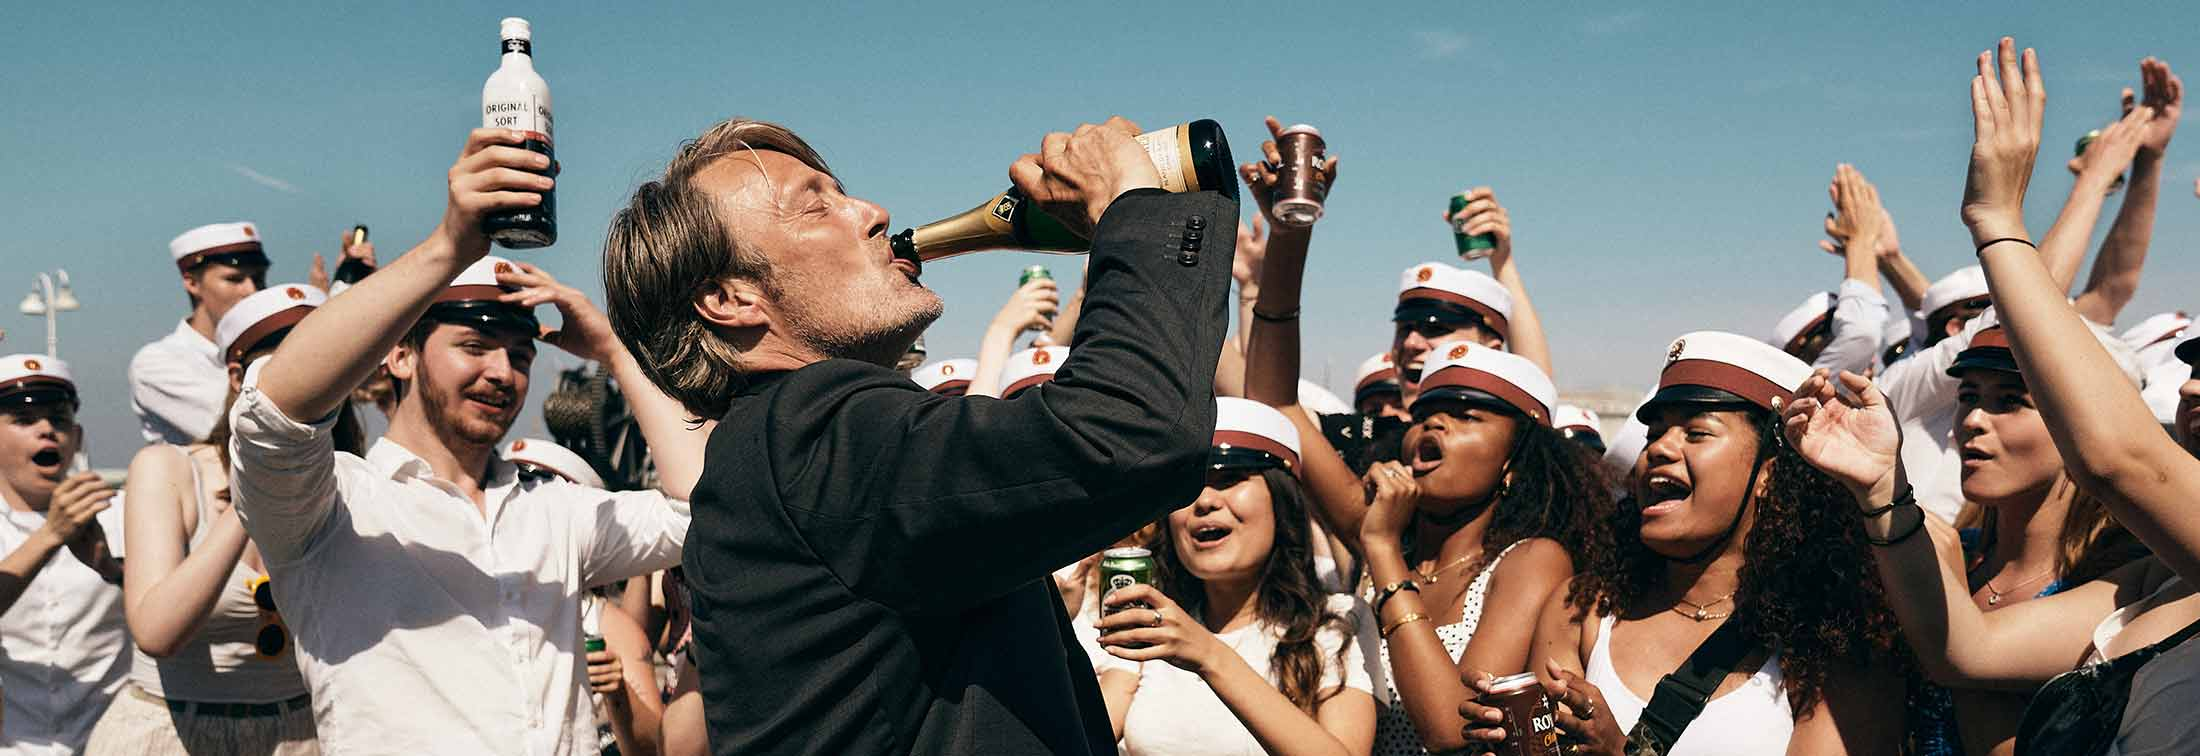 Adelaide Film Festival 2020 - The reviews